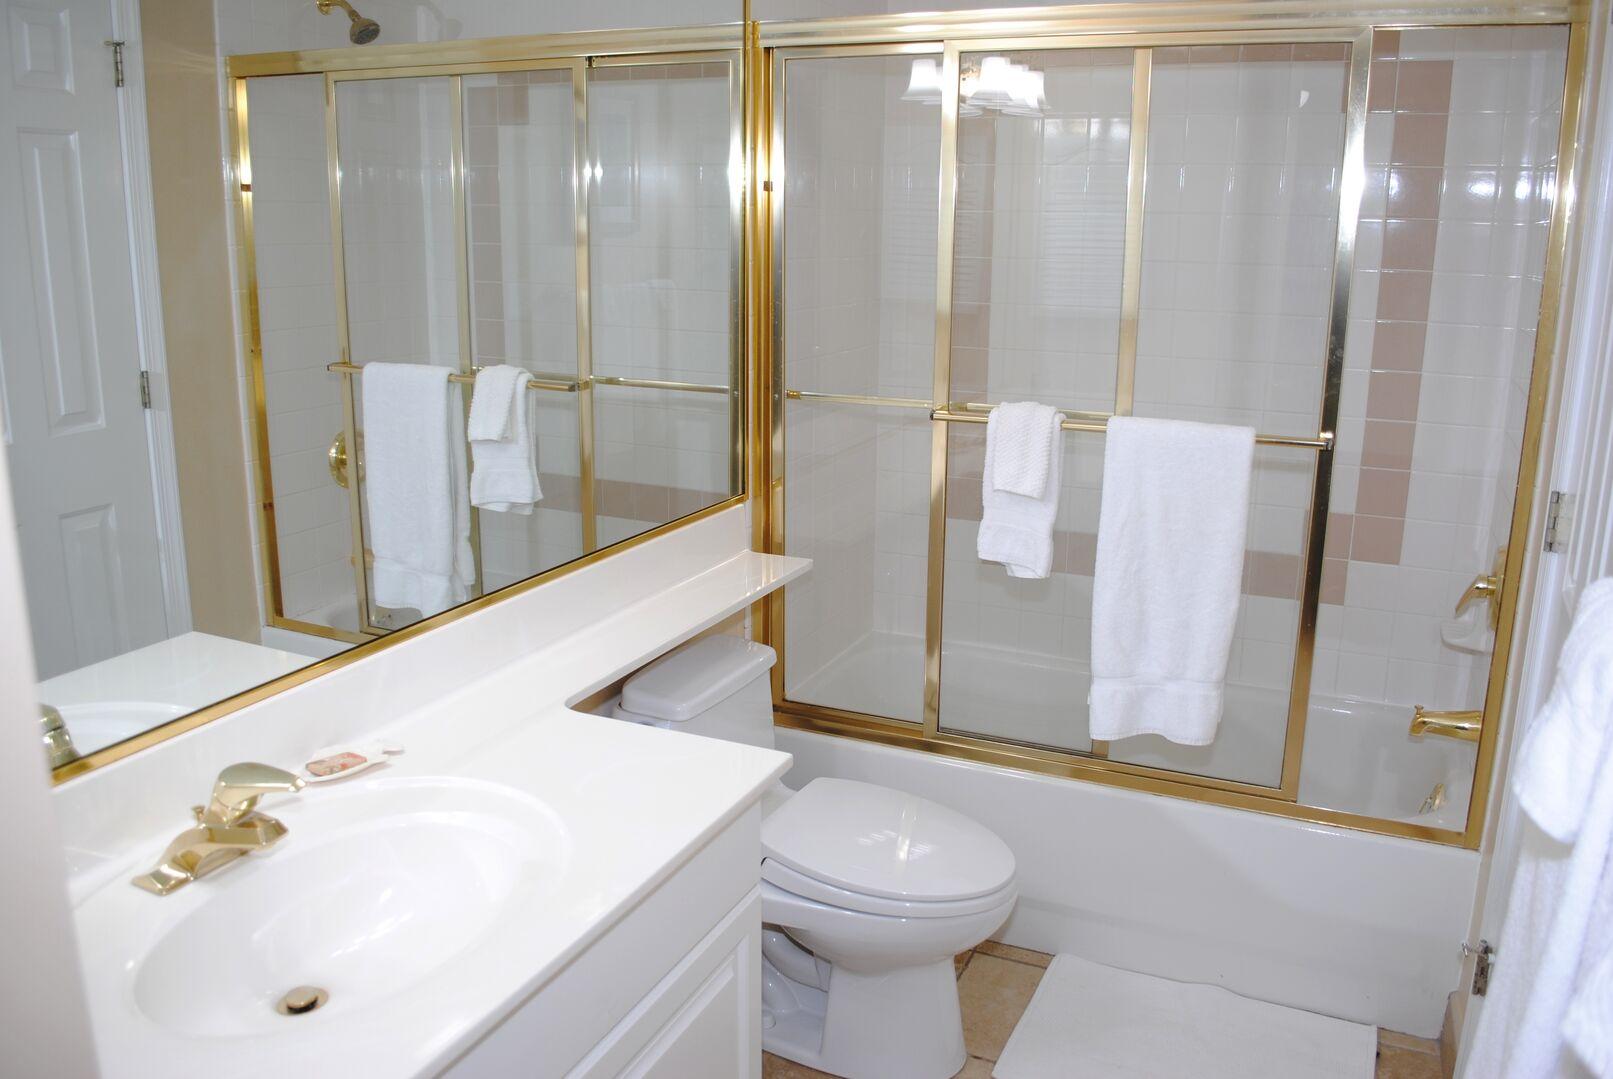 Bathroom between hallway and twins bedroom